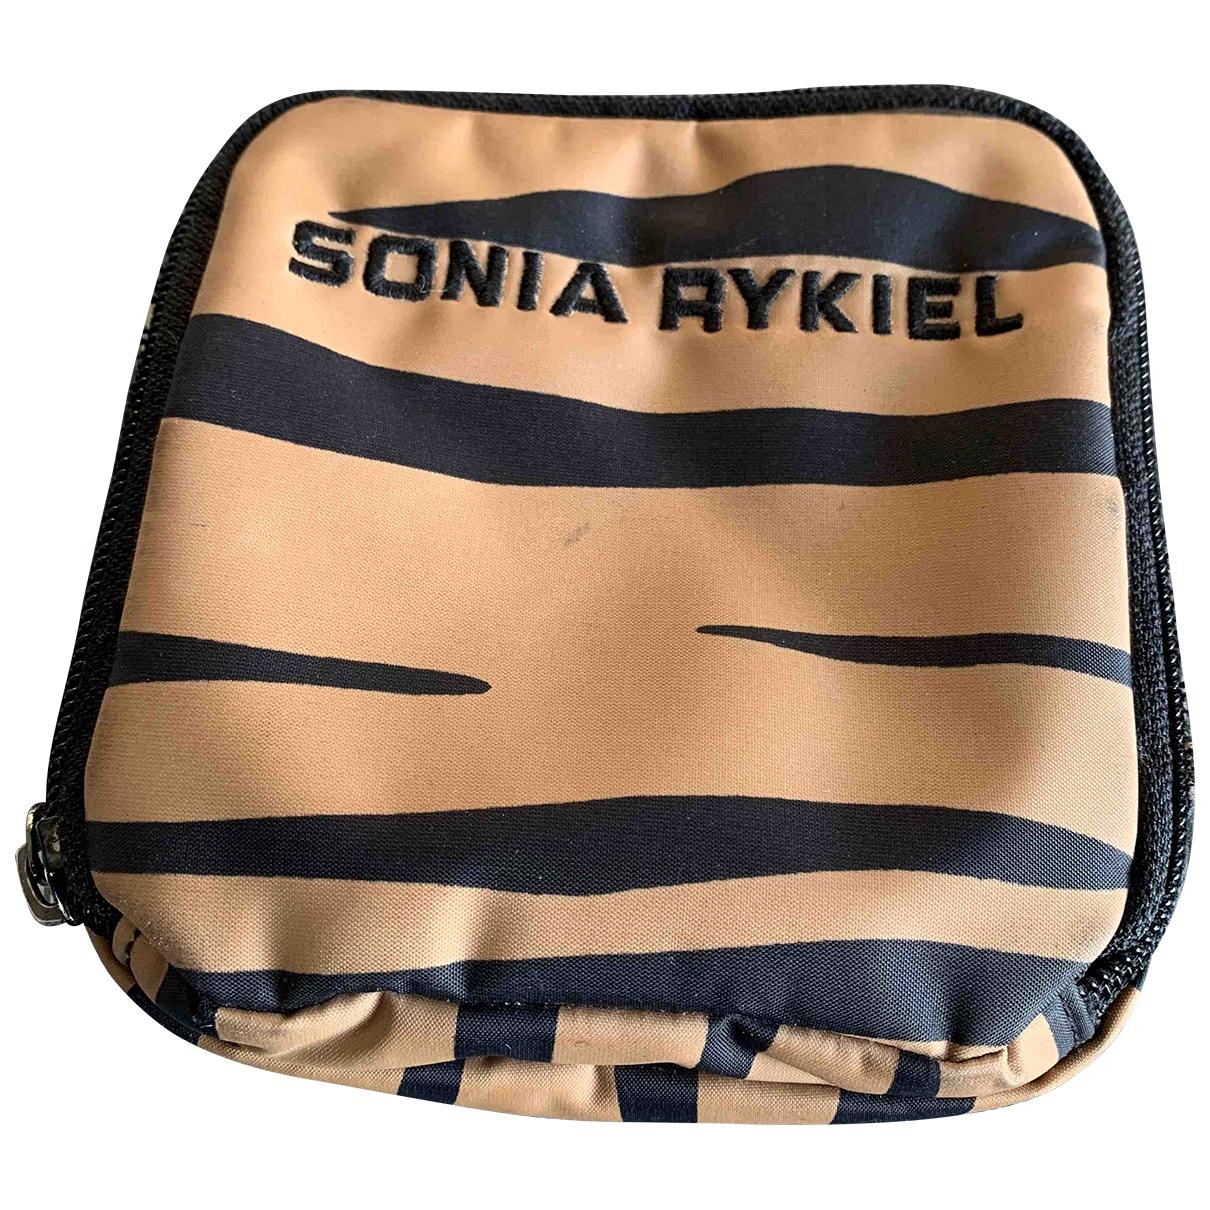 Sonia Rykiel - Petite maroquinerie   pour femme en toile - beige